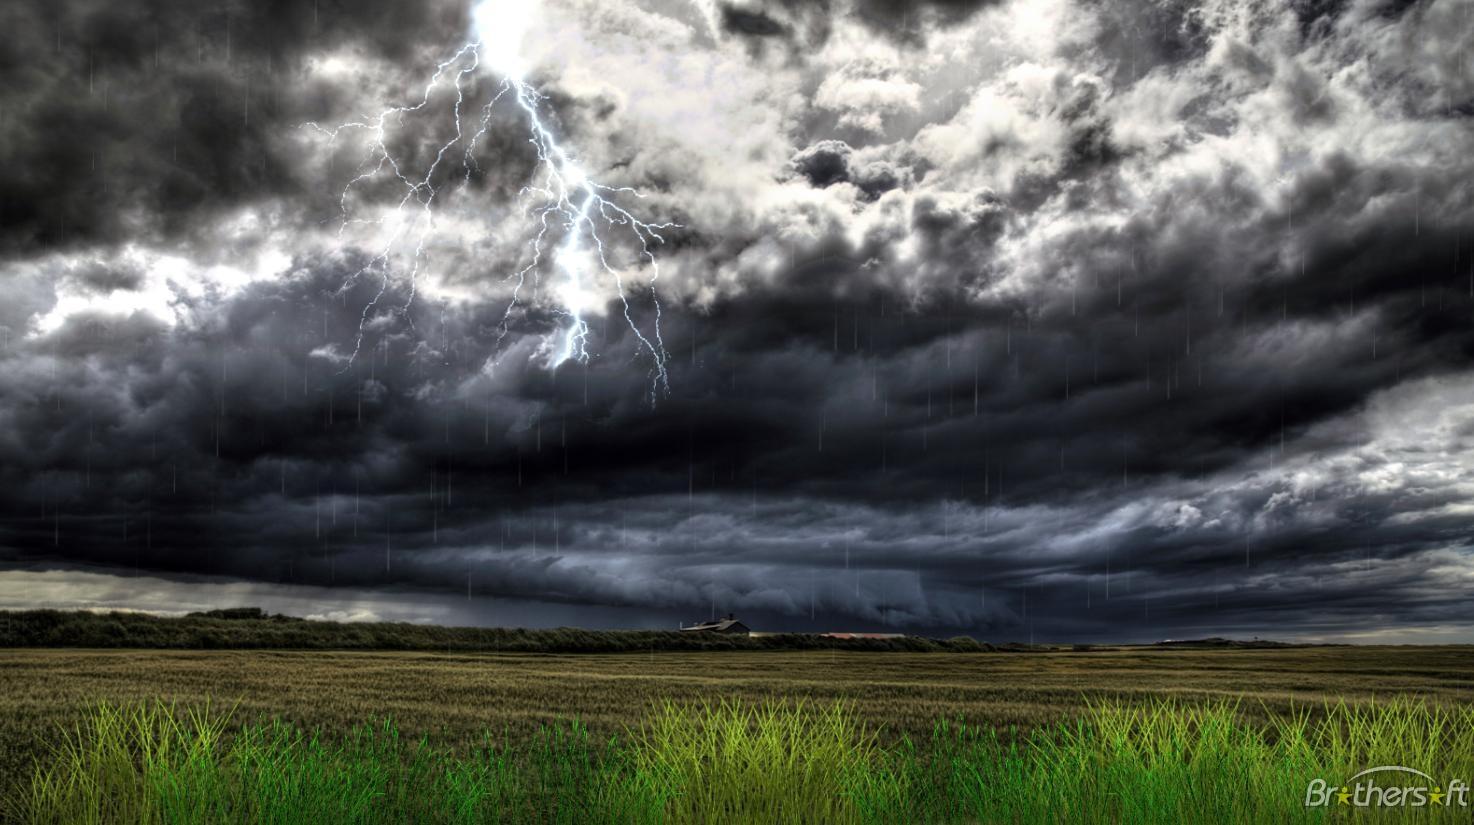 Download Thunderstorm Field Screensaver Thunderstorm Field 1474x825